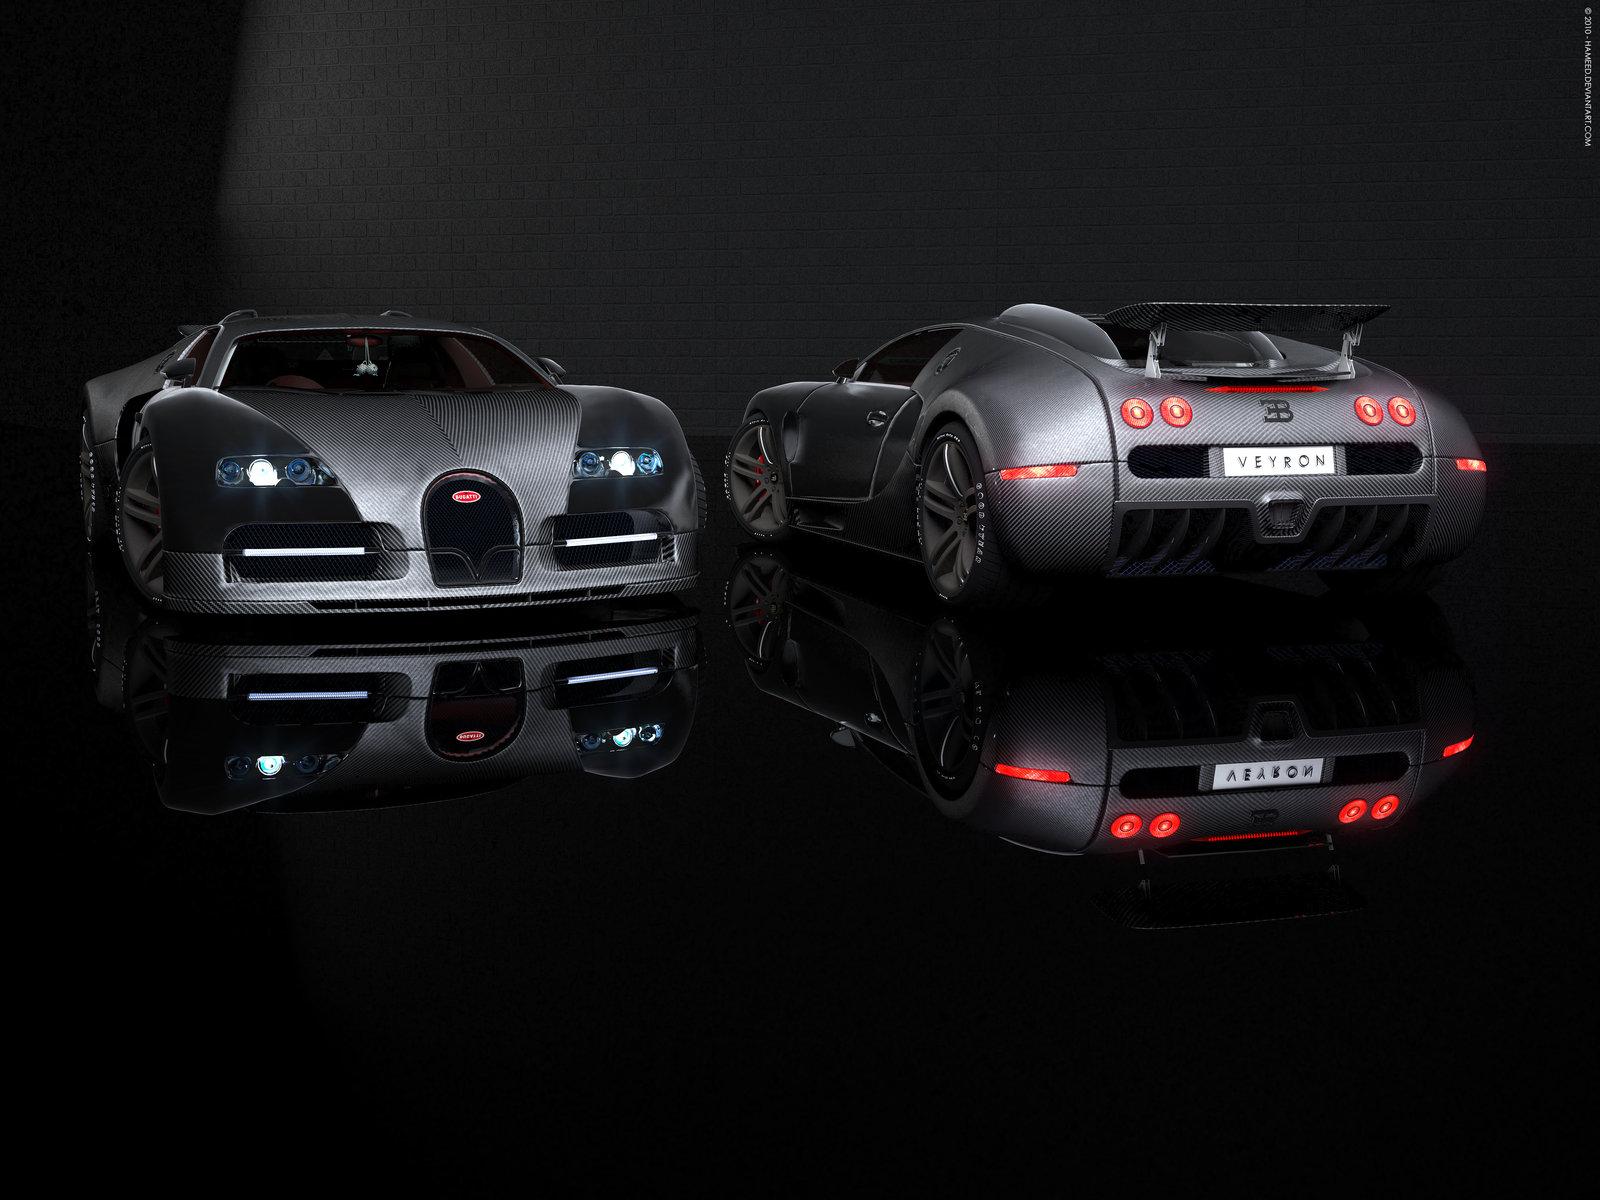 Audi Car Logo Wallpapers Bugatti Veyron Cars Wallpapers Cars Wallpapers Collections